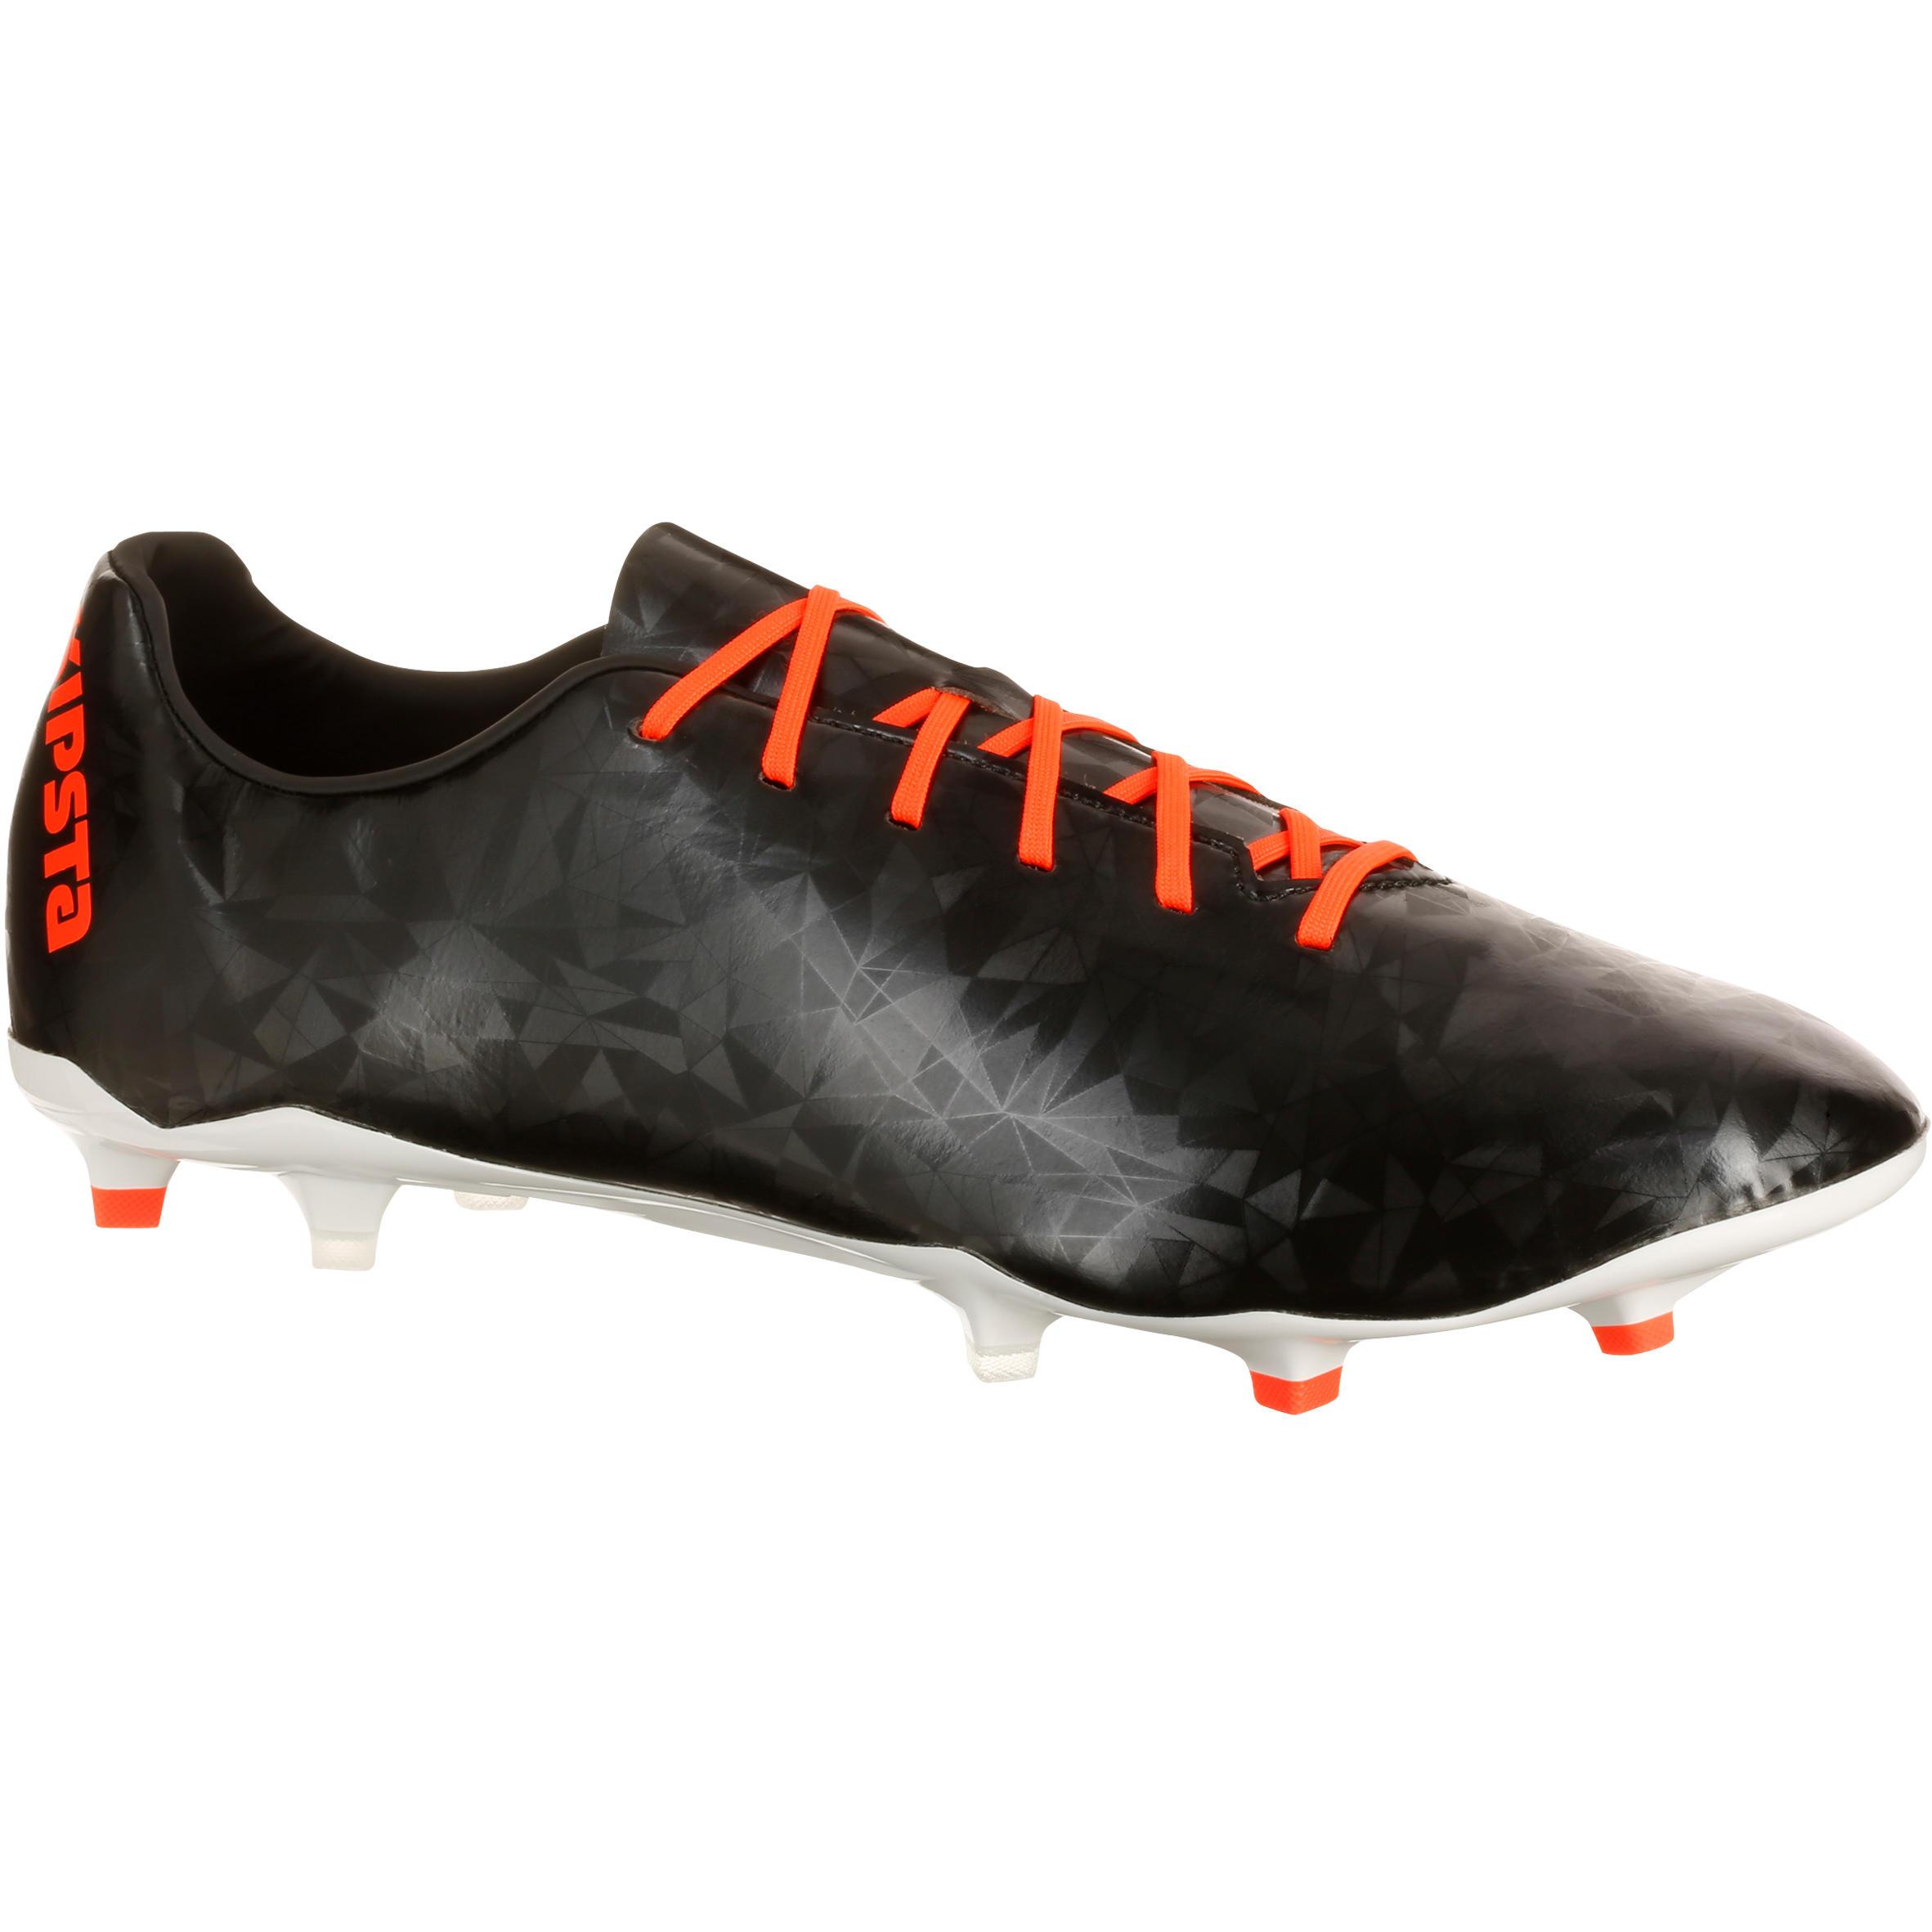 CLR 700 FG Kipsta voetbalschoen